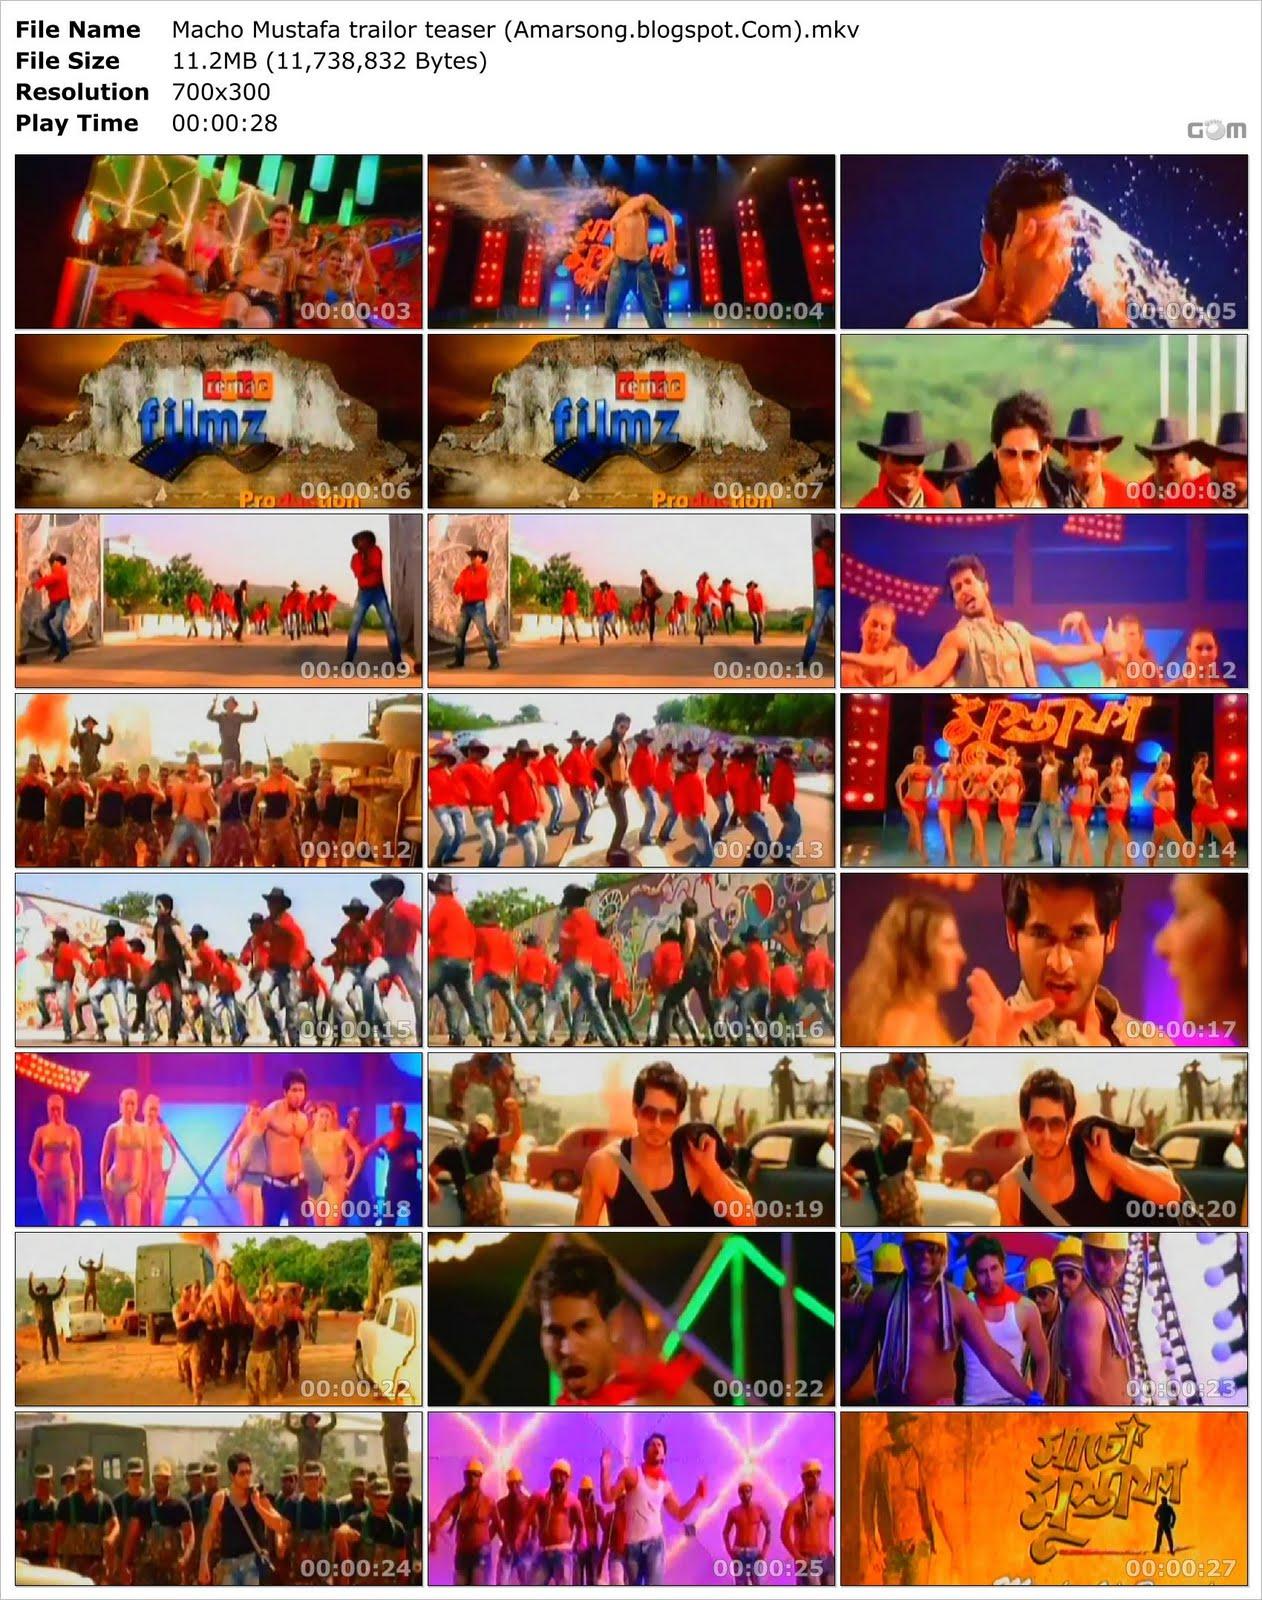 Macho Mustafa 2012 Trailer Teaser Download